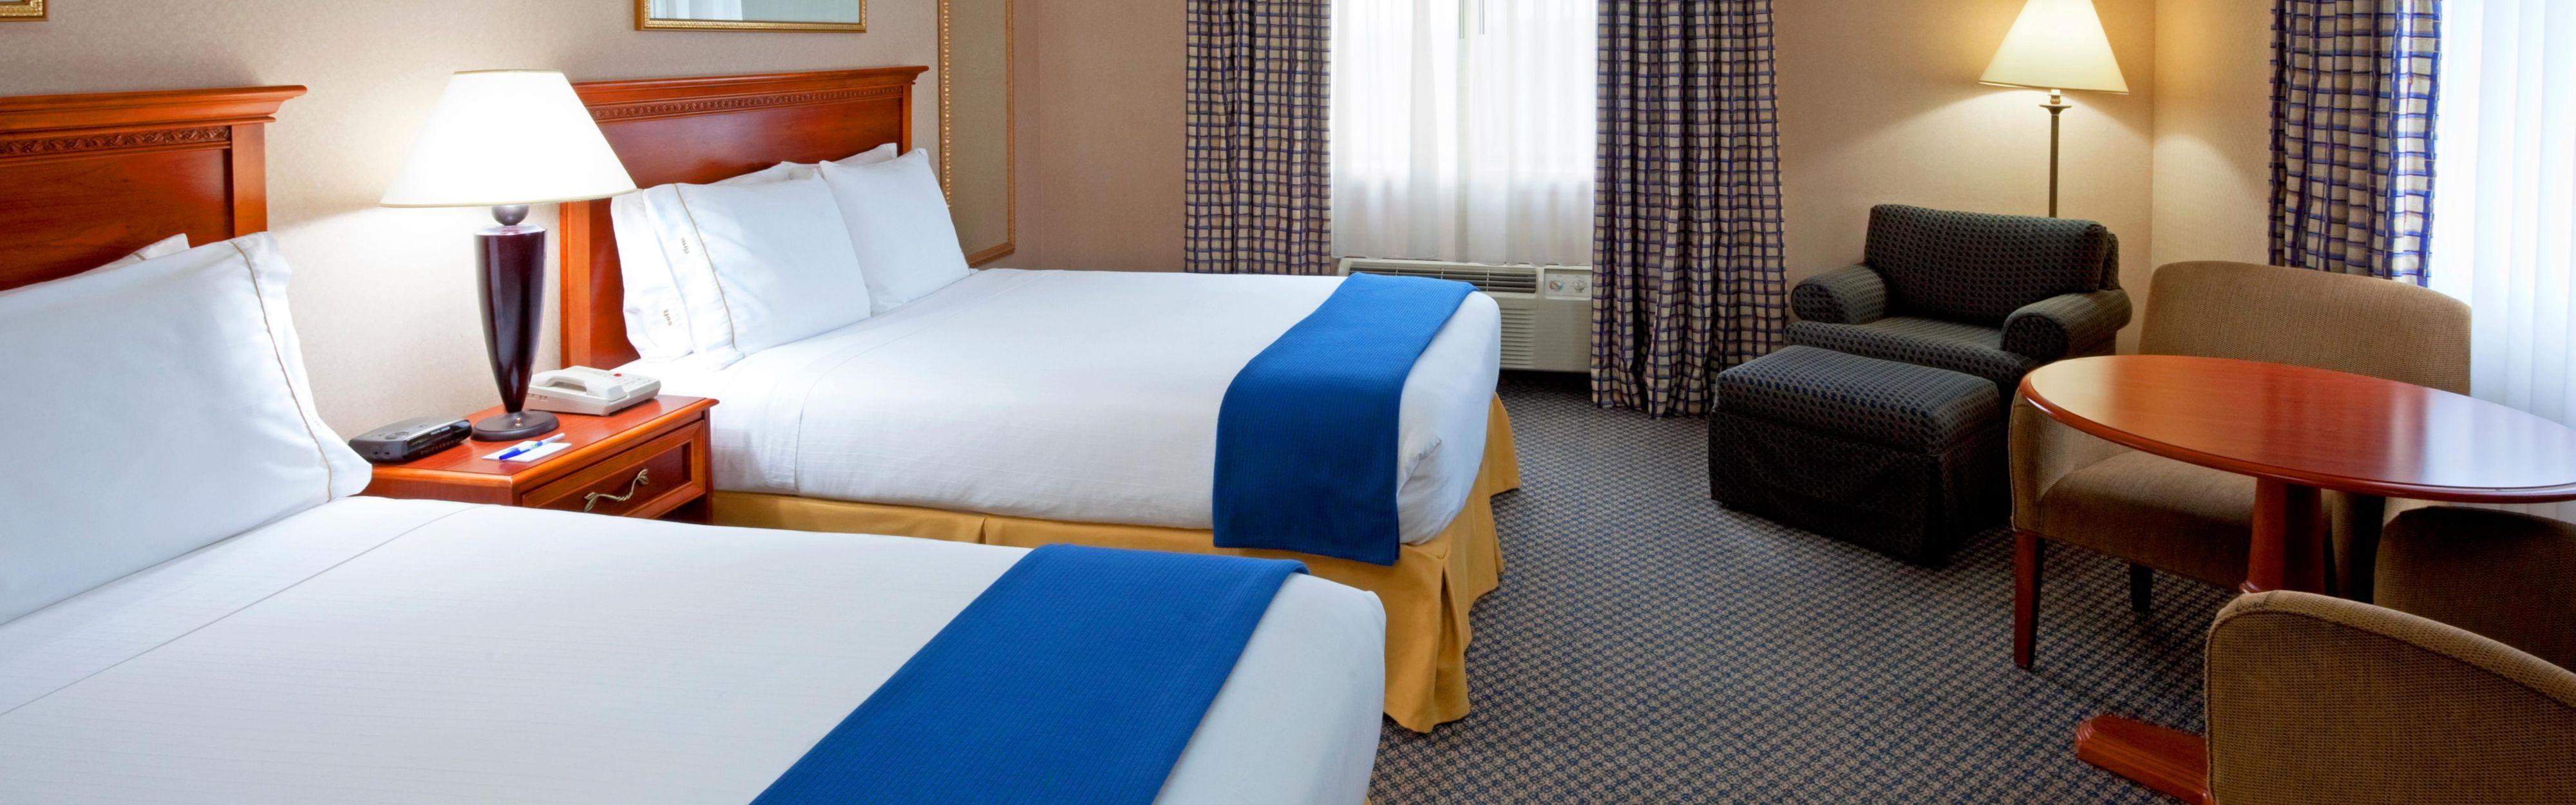 Holiday Inn Express & Suites East Greenbush(Albany-Skyline) image 1